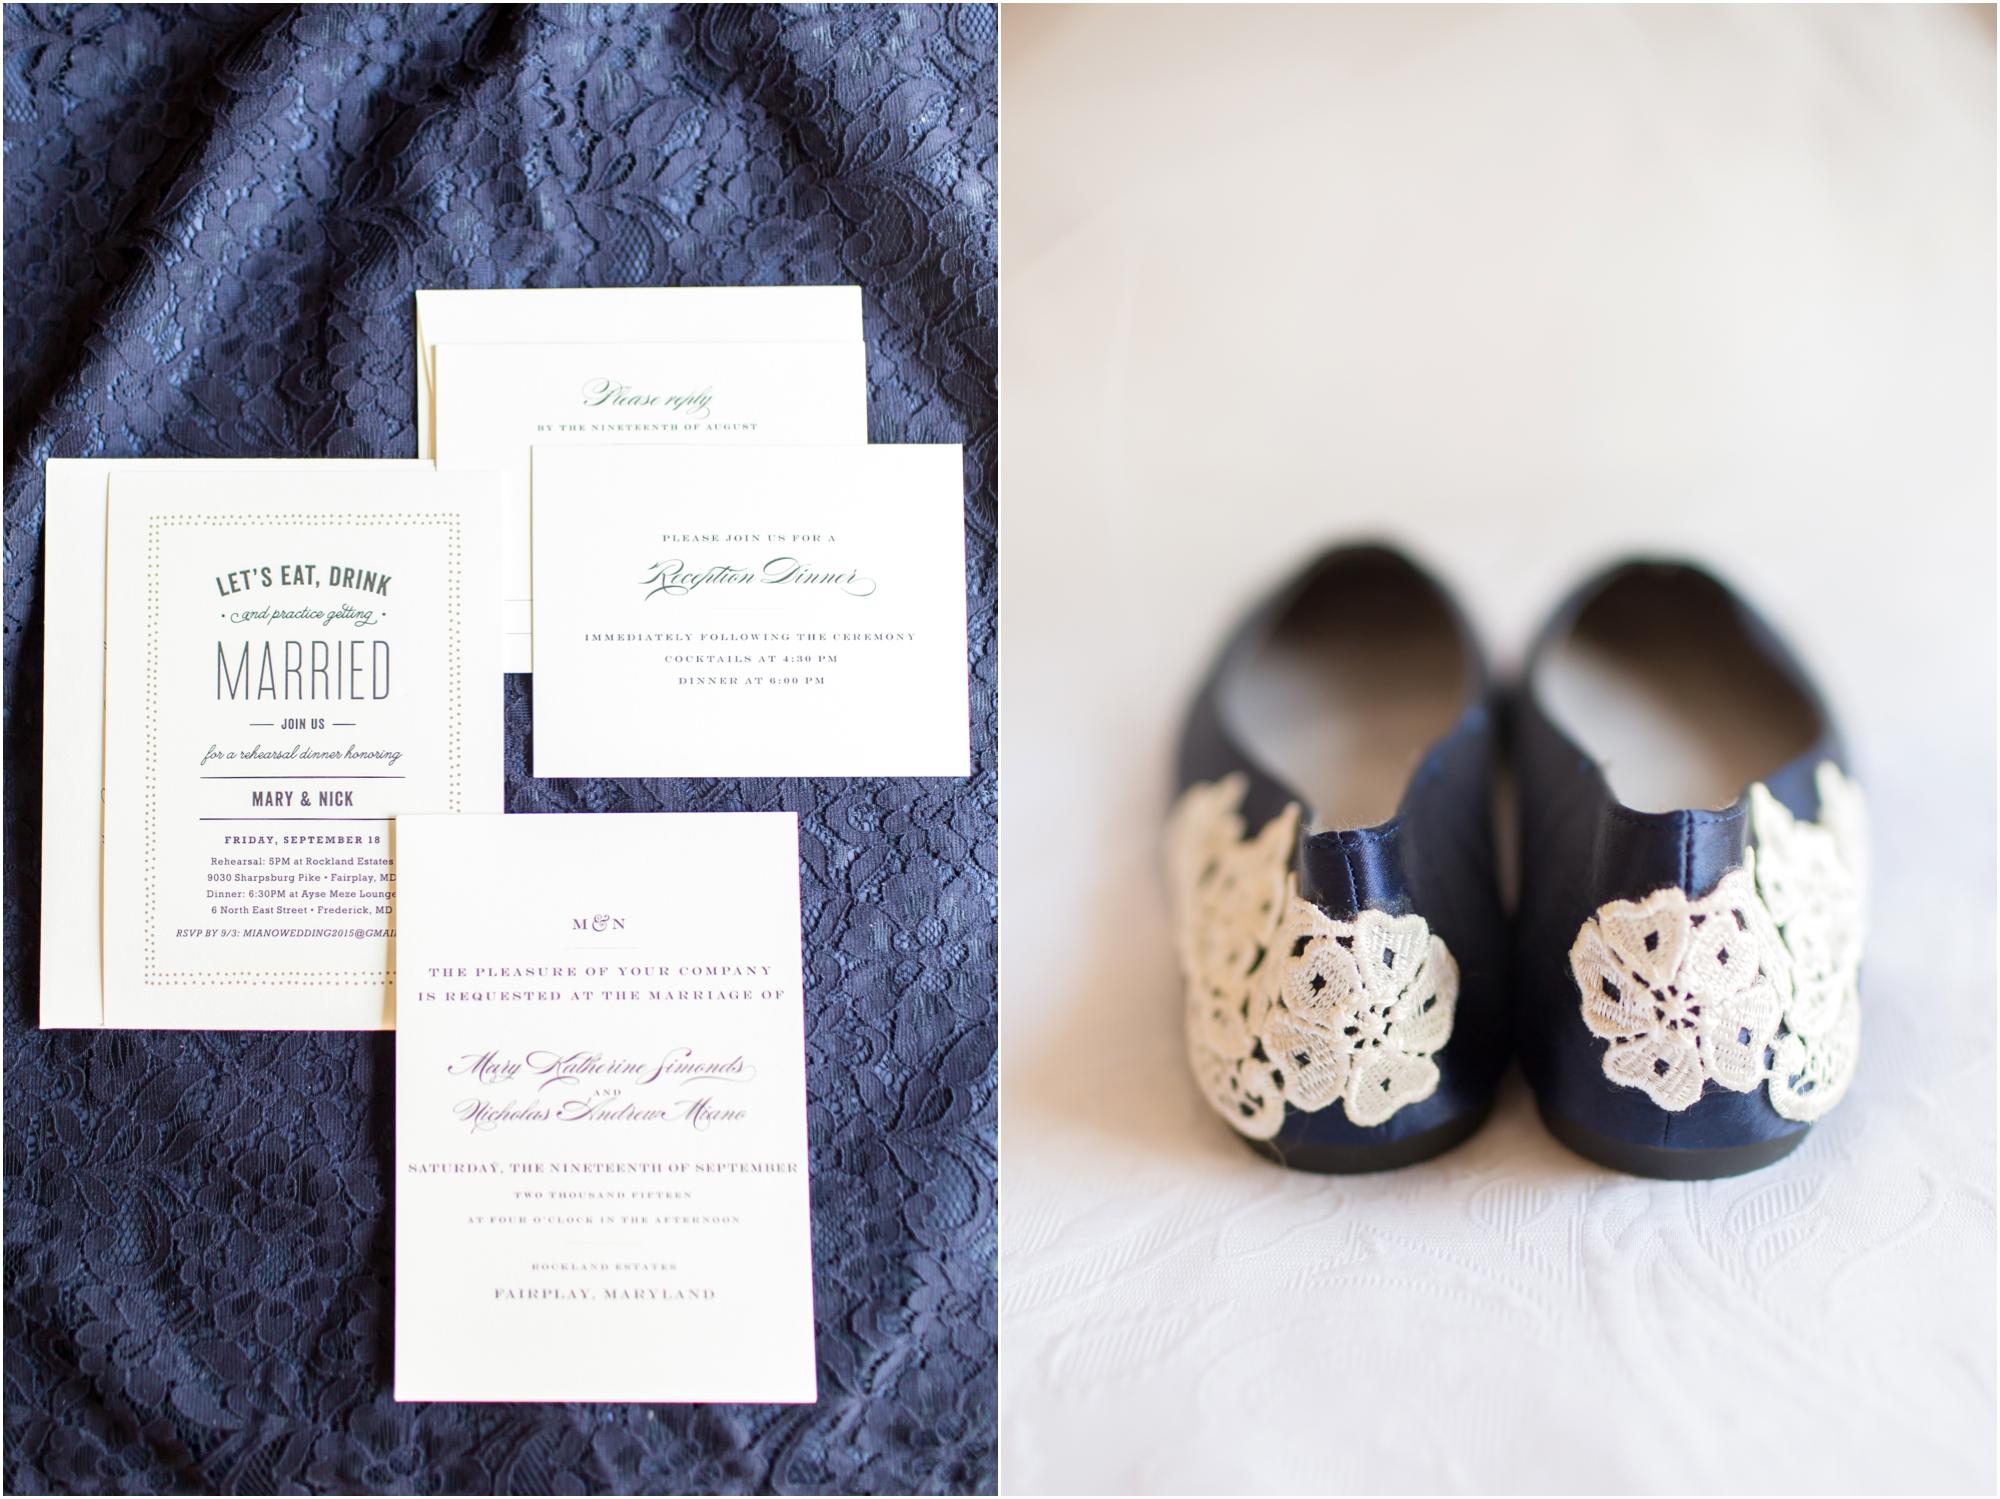 1-Miano Wedding Getting Ready-108_anna grace photography maryland wedding photographer rockland estates.jpg